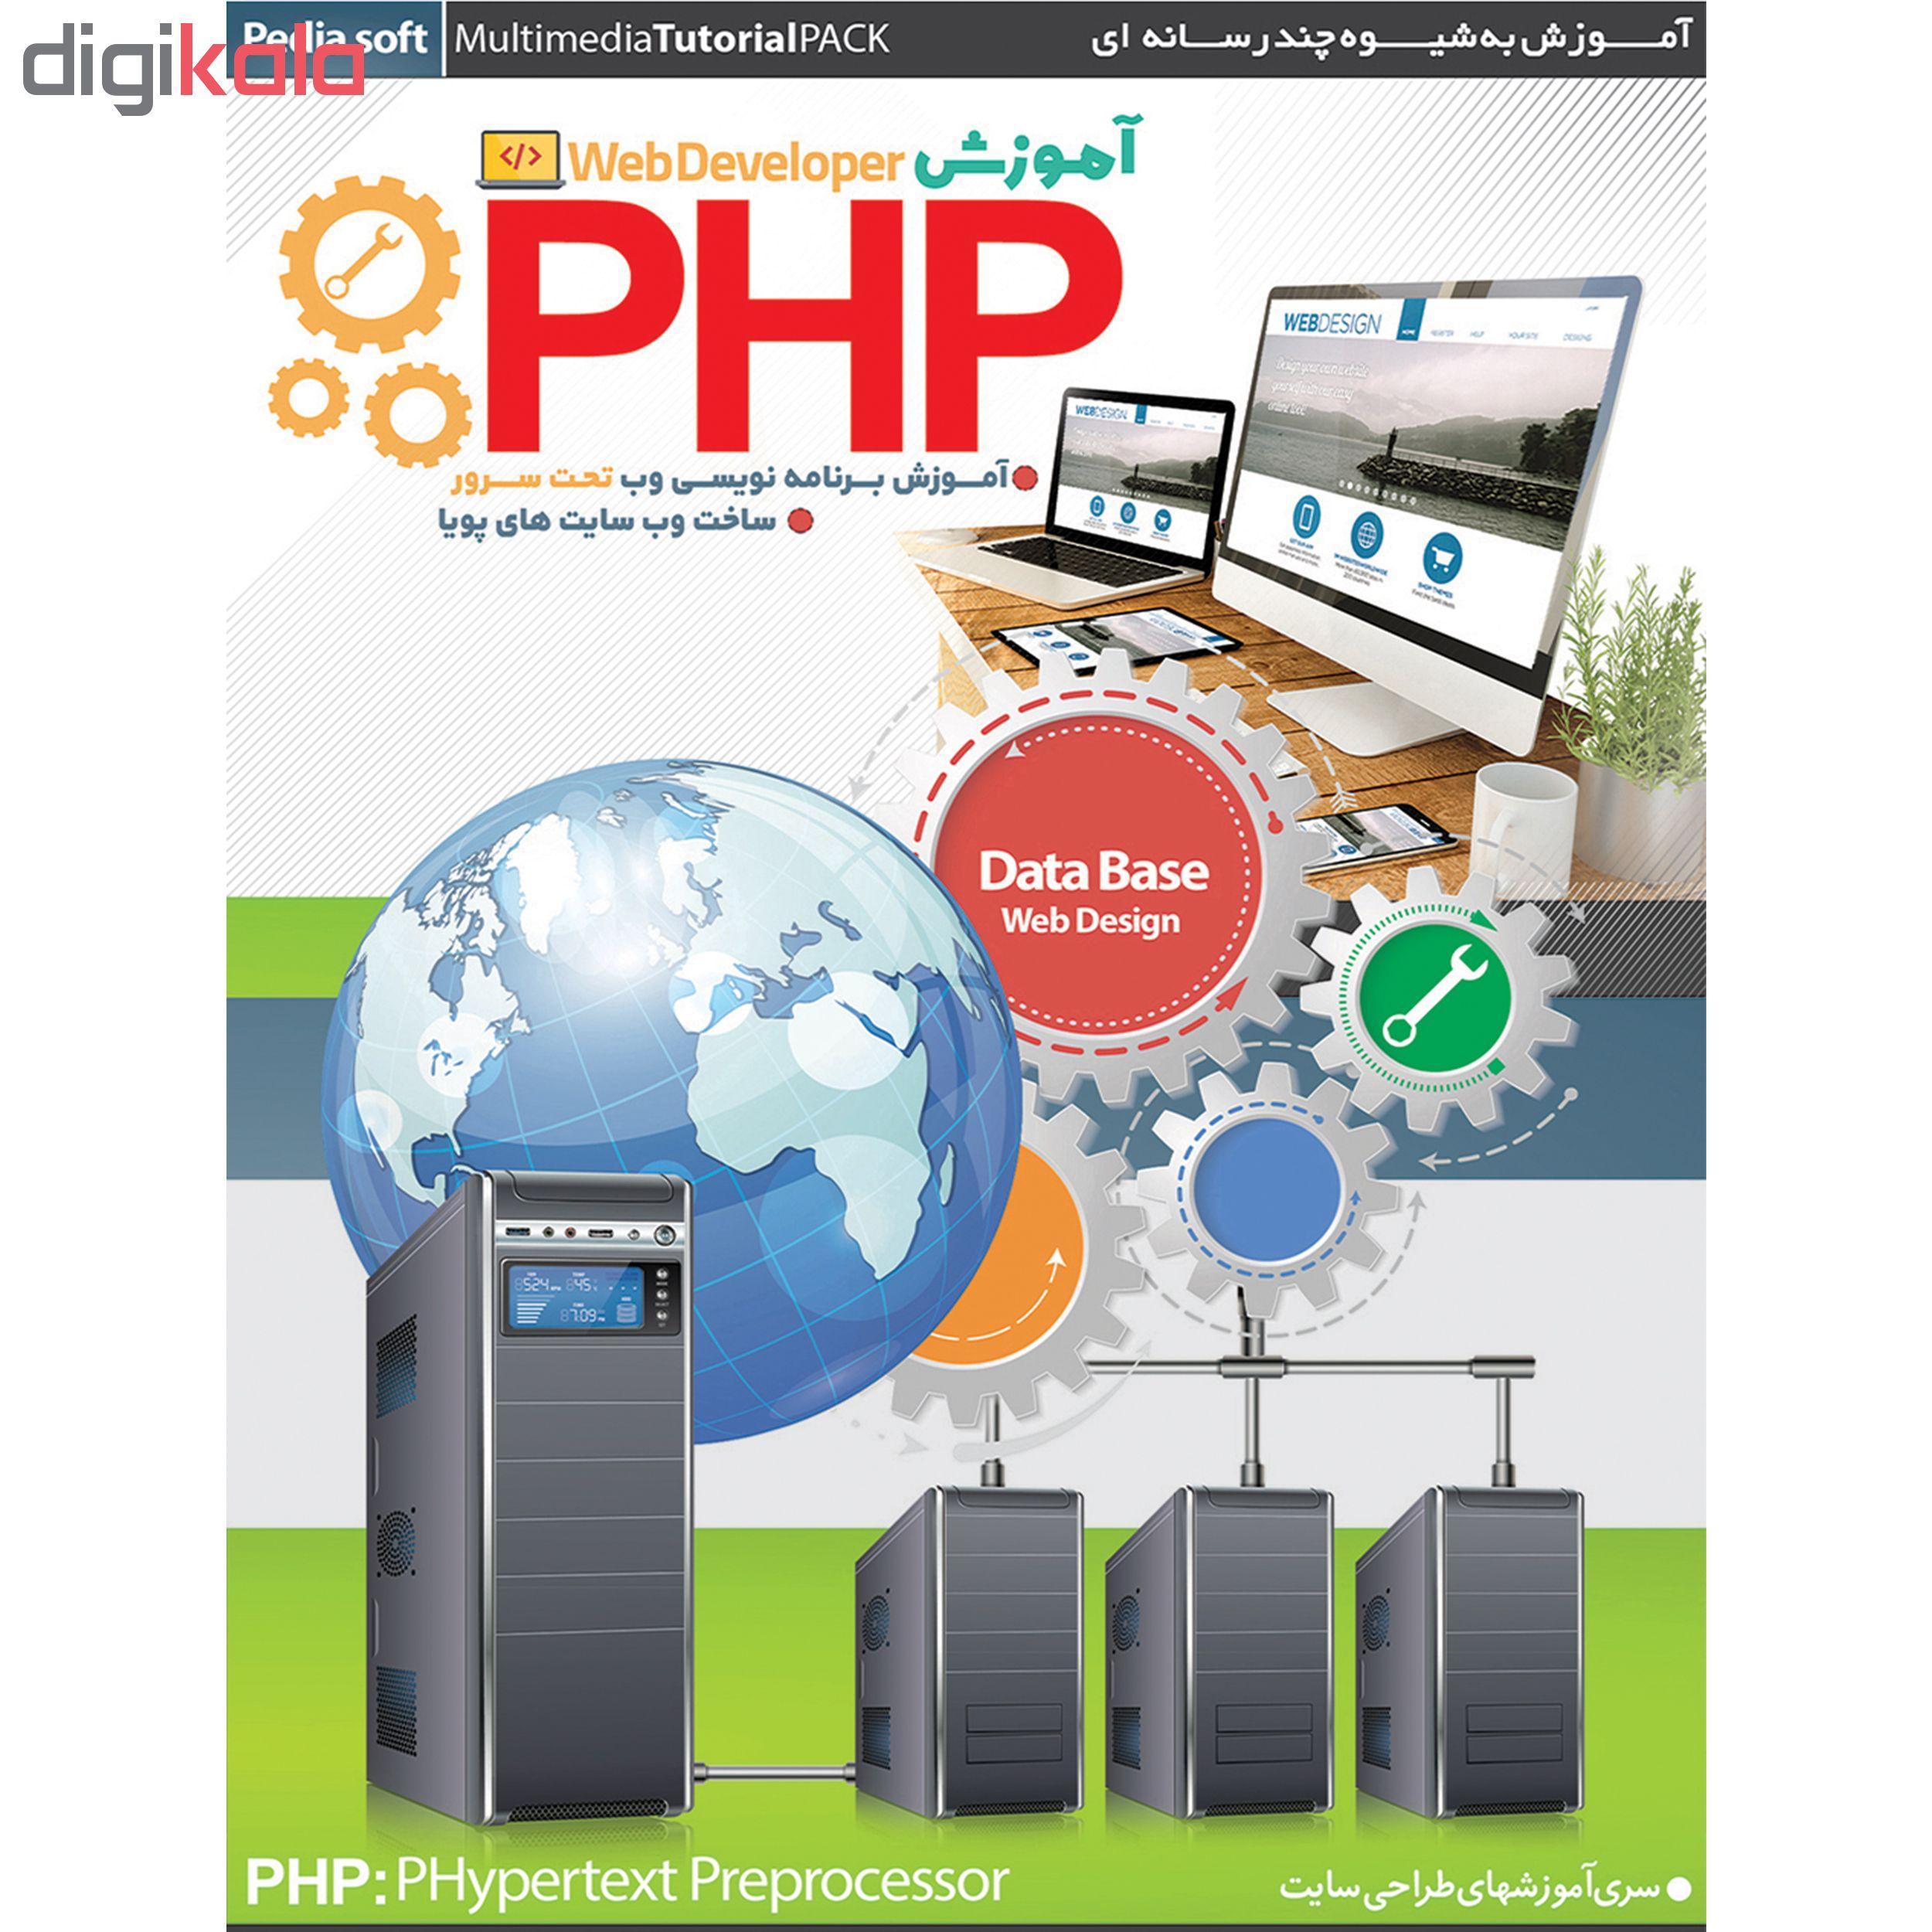 نرم افزار آموزش JAVA نشر پدیده به همراه نرم افزار آموزش PHP نشر پدیا سافت